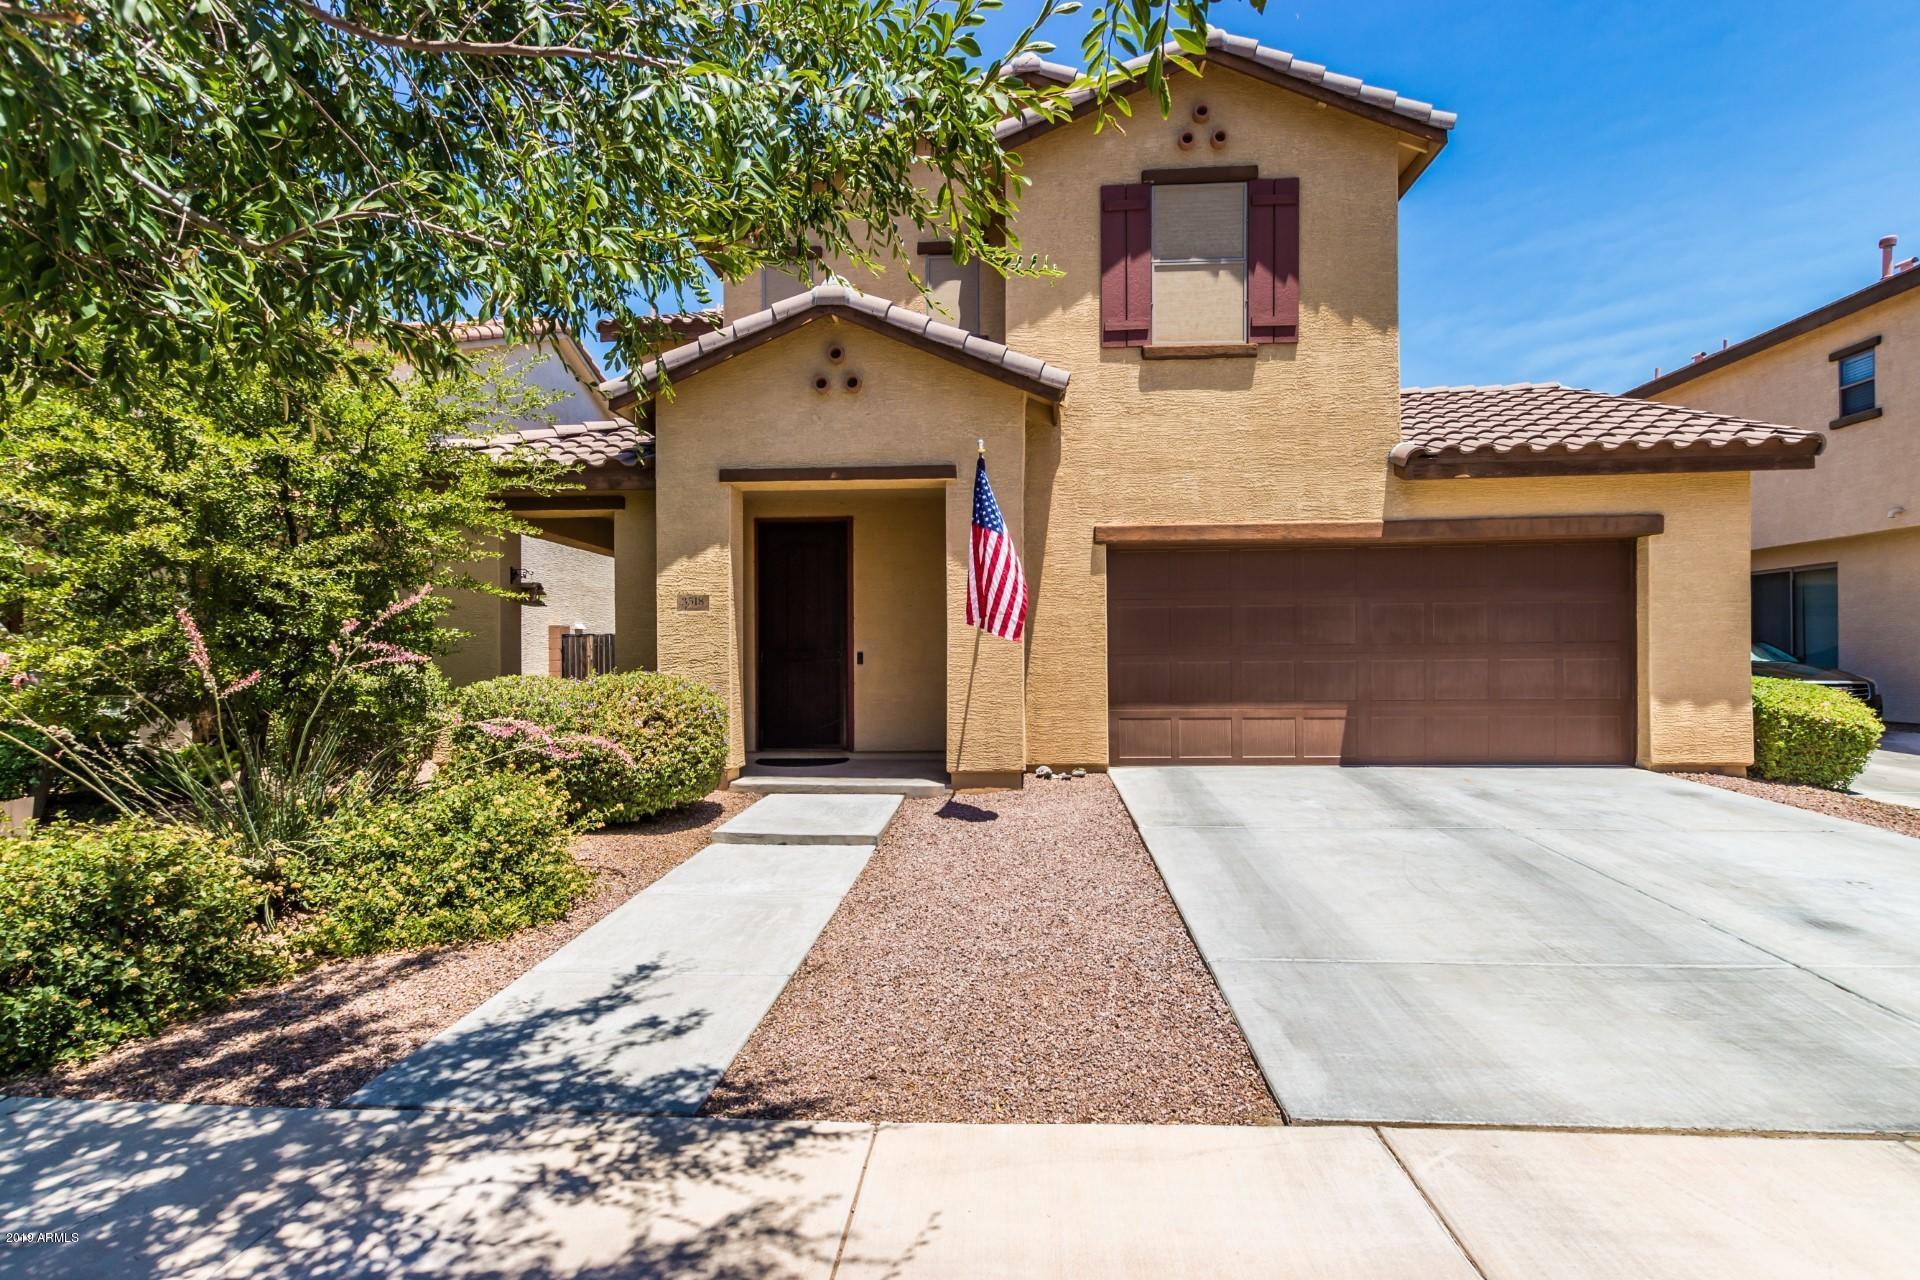 Photo of 3518 E Carla Vista Drive, Gilbert, AZ 85295